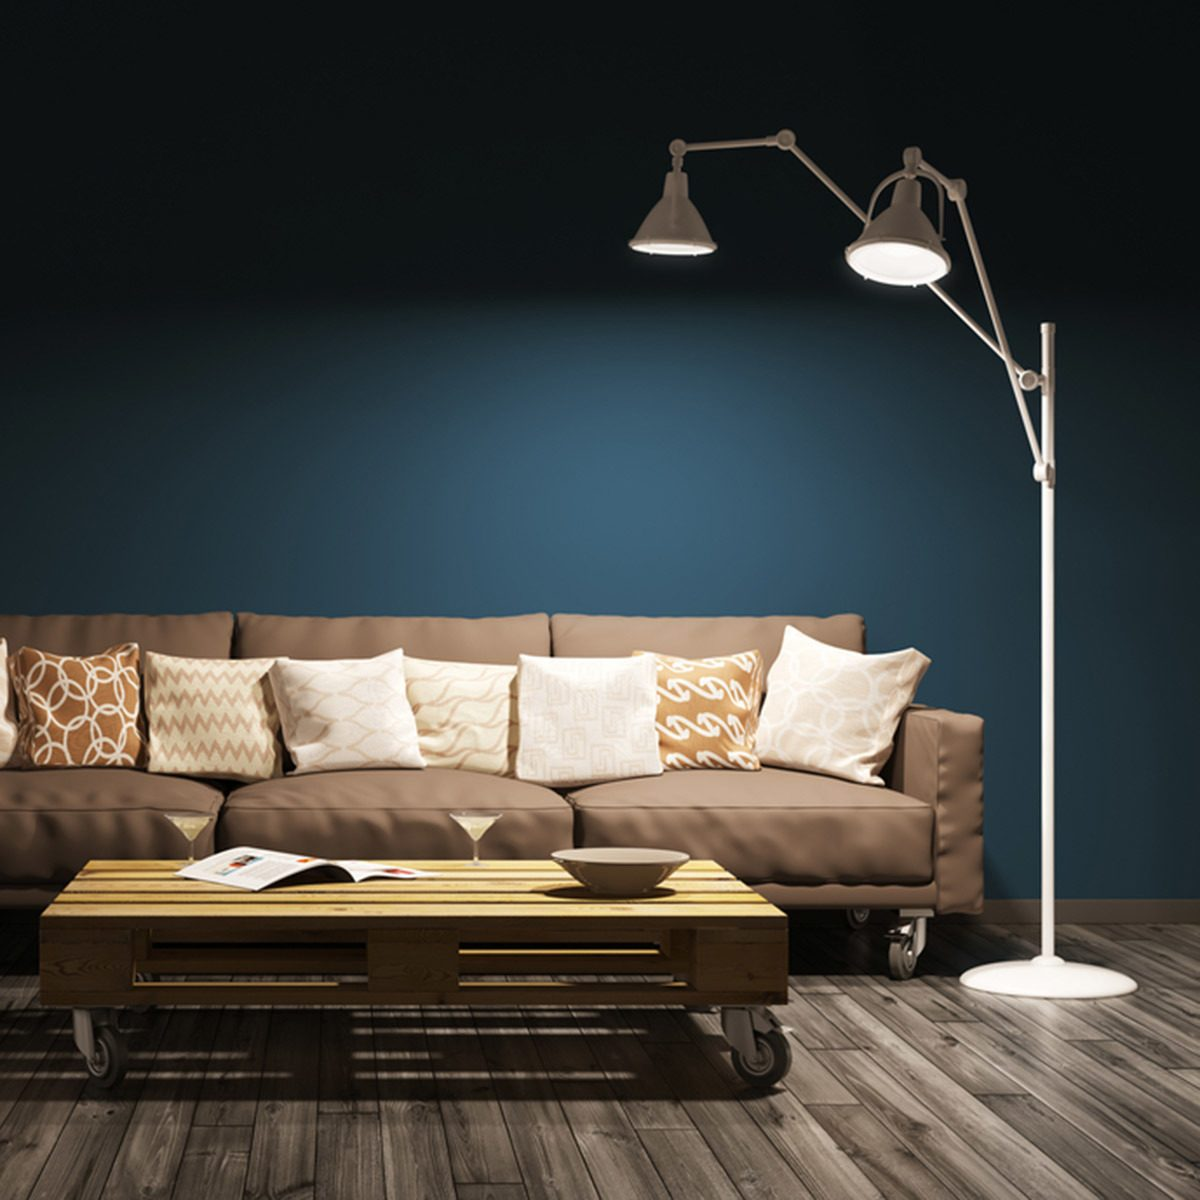 Choose a Long-Reach Floor Lamp